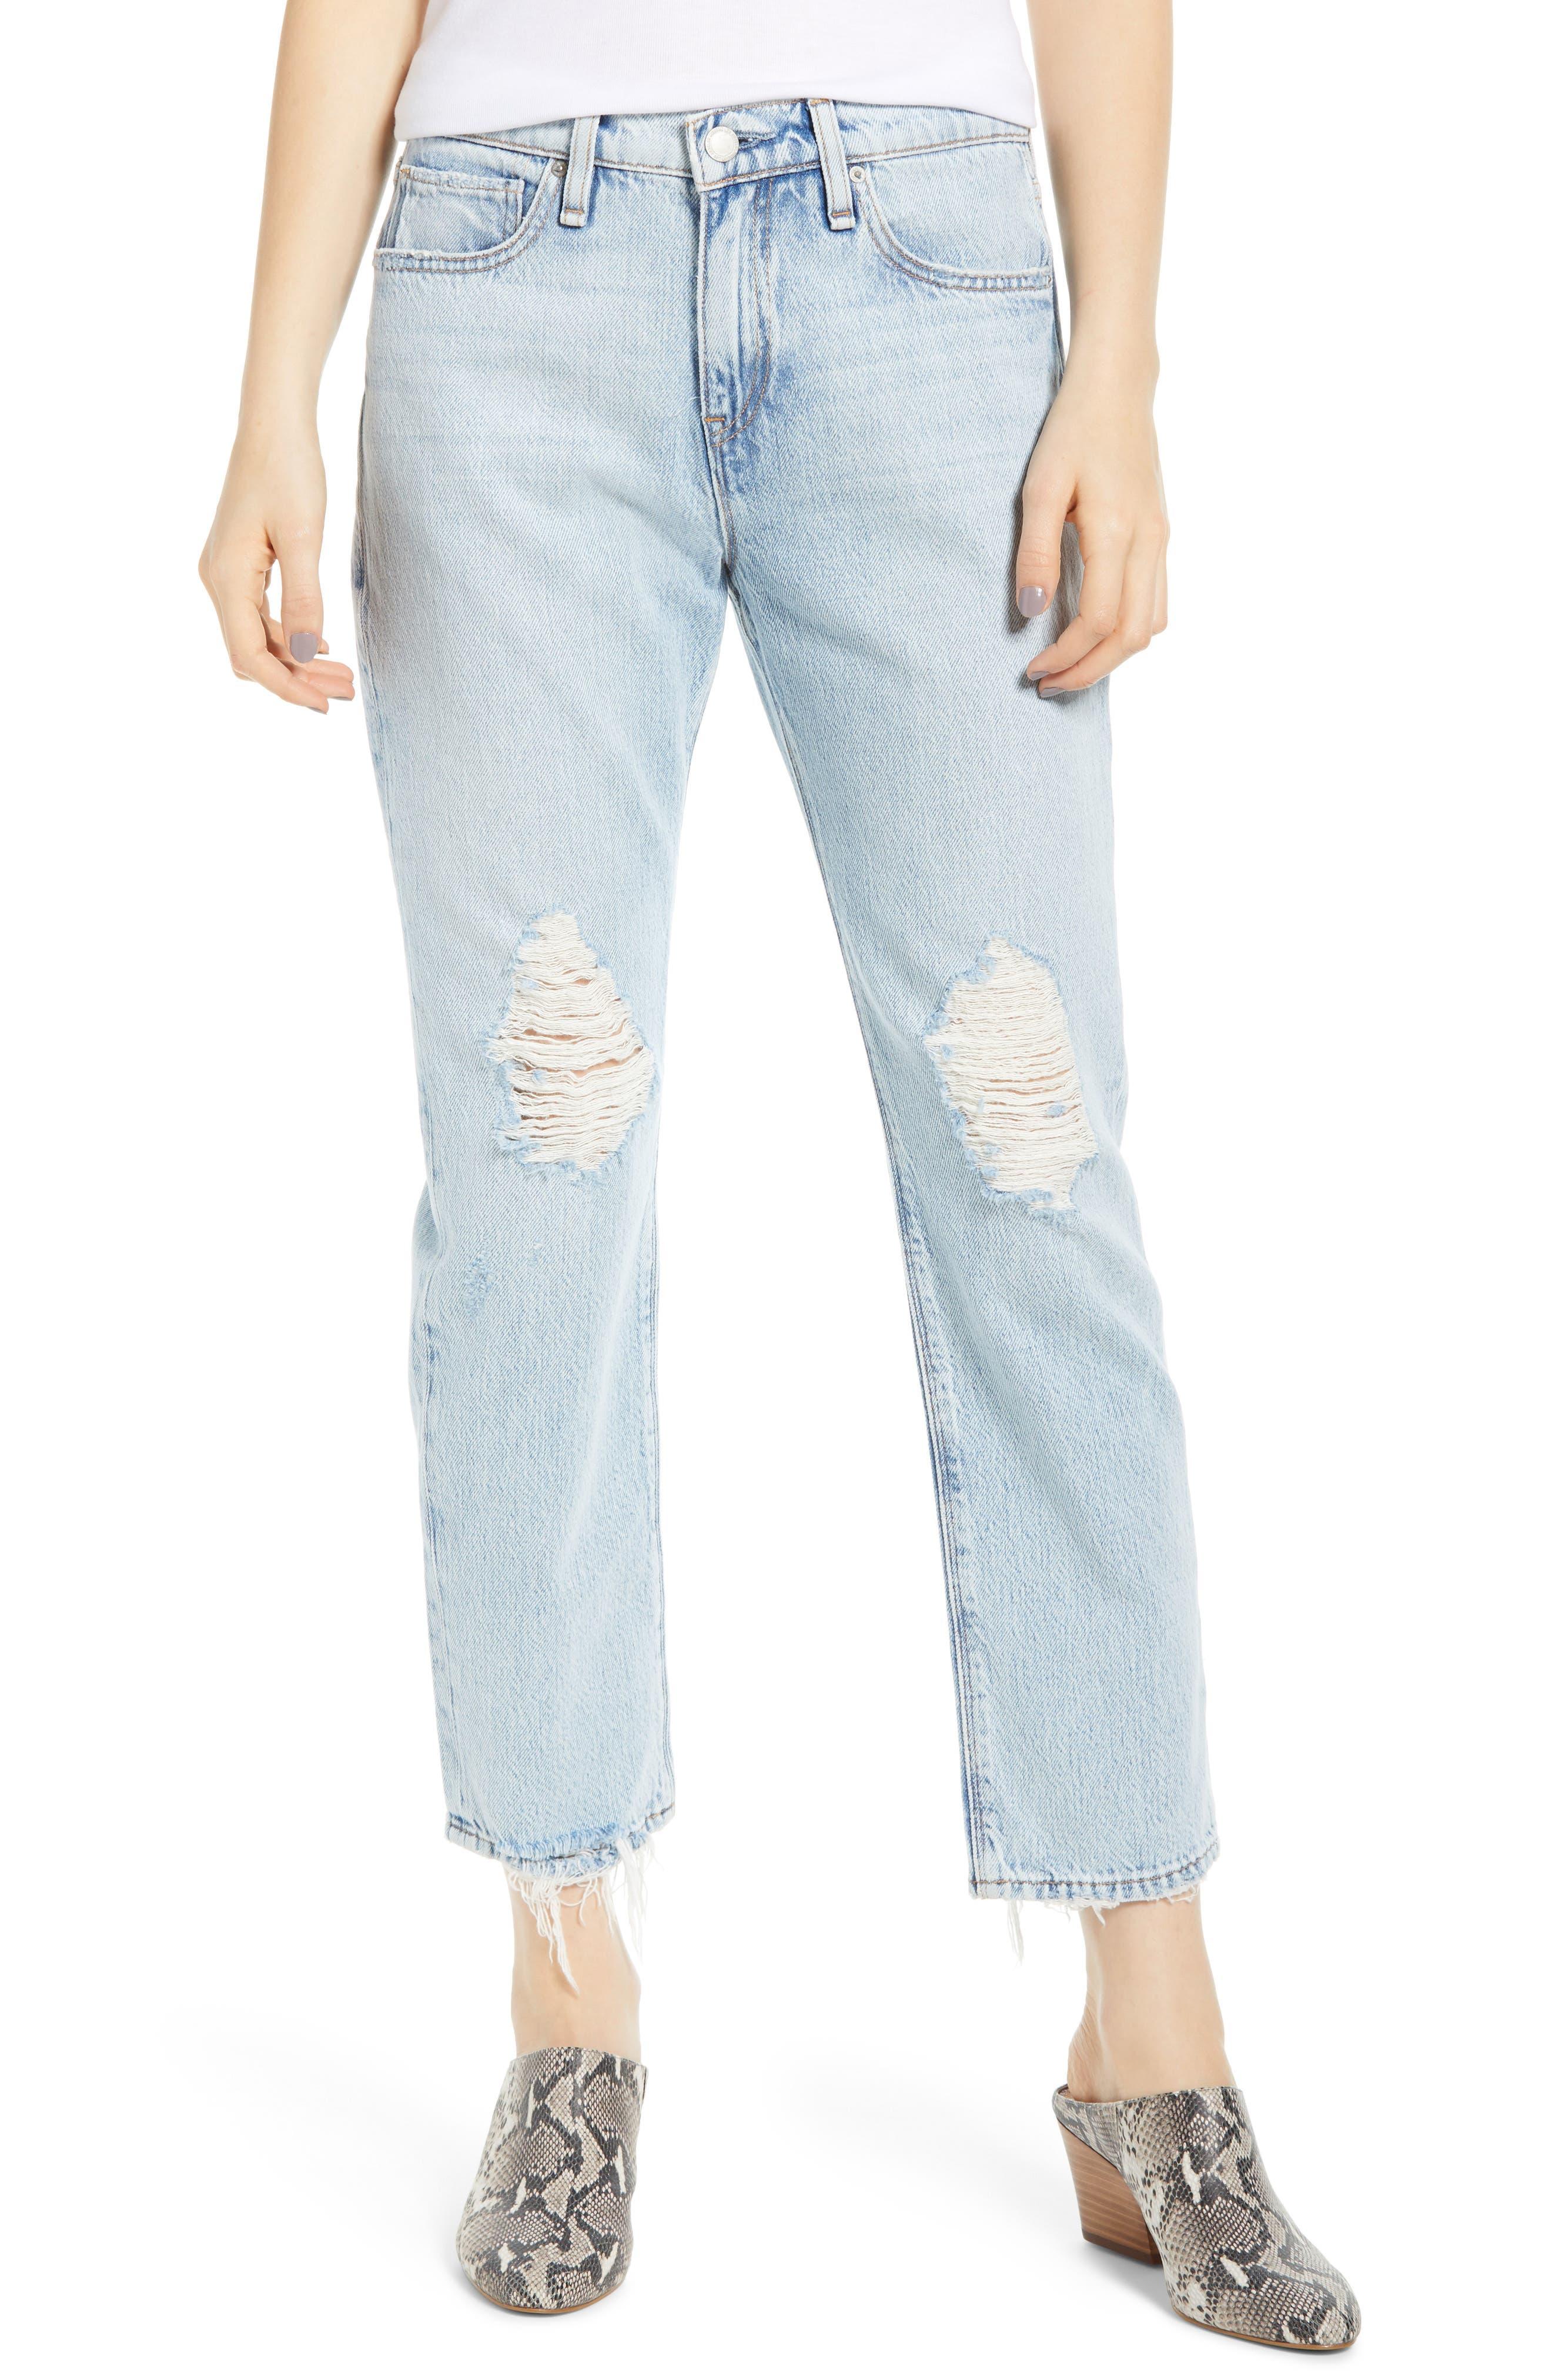 HUDSON JEANS, Jessi Ripped Crop Boyfriend Jeans, Main thumbnail 1, color, SAVE TONIGHT